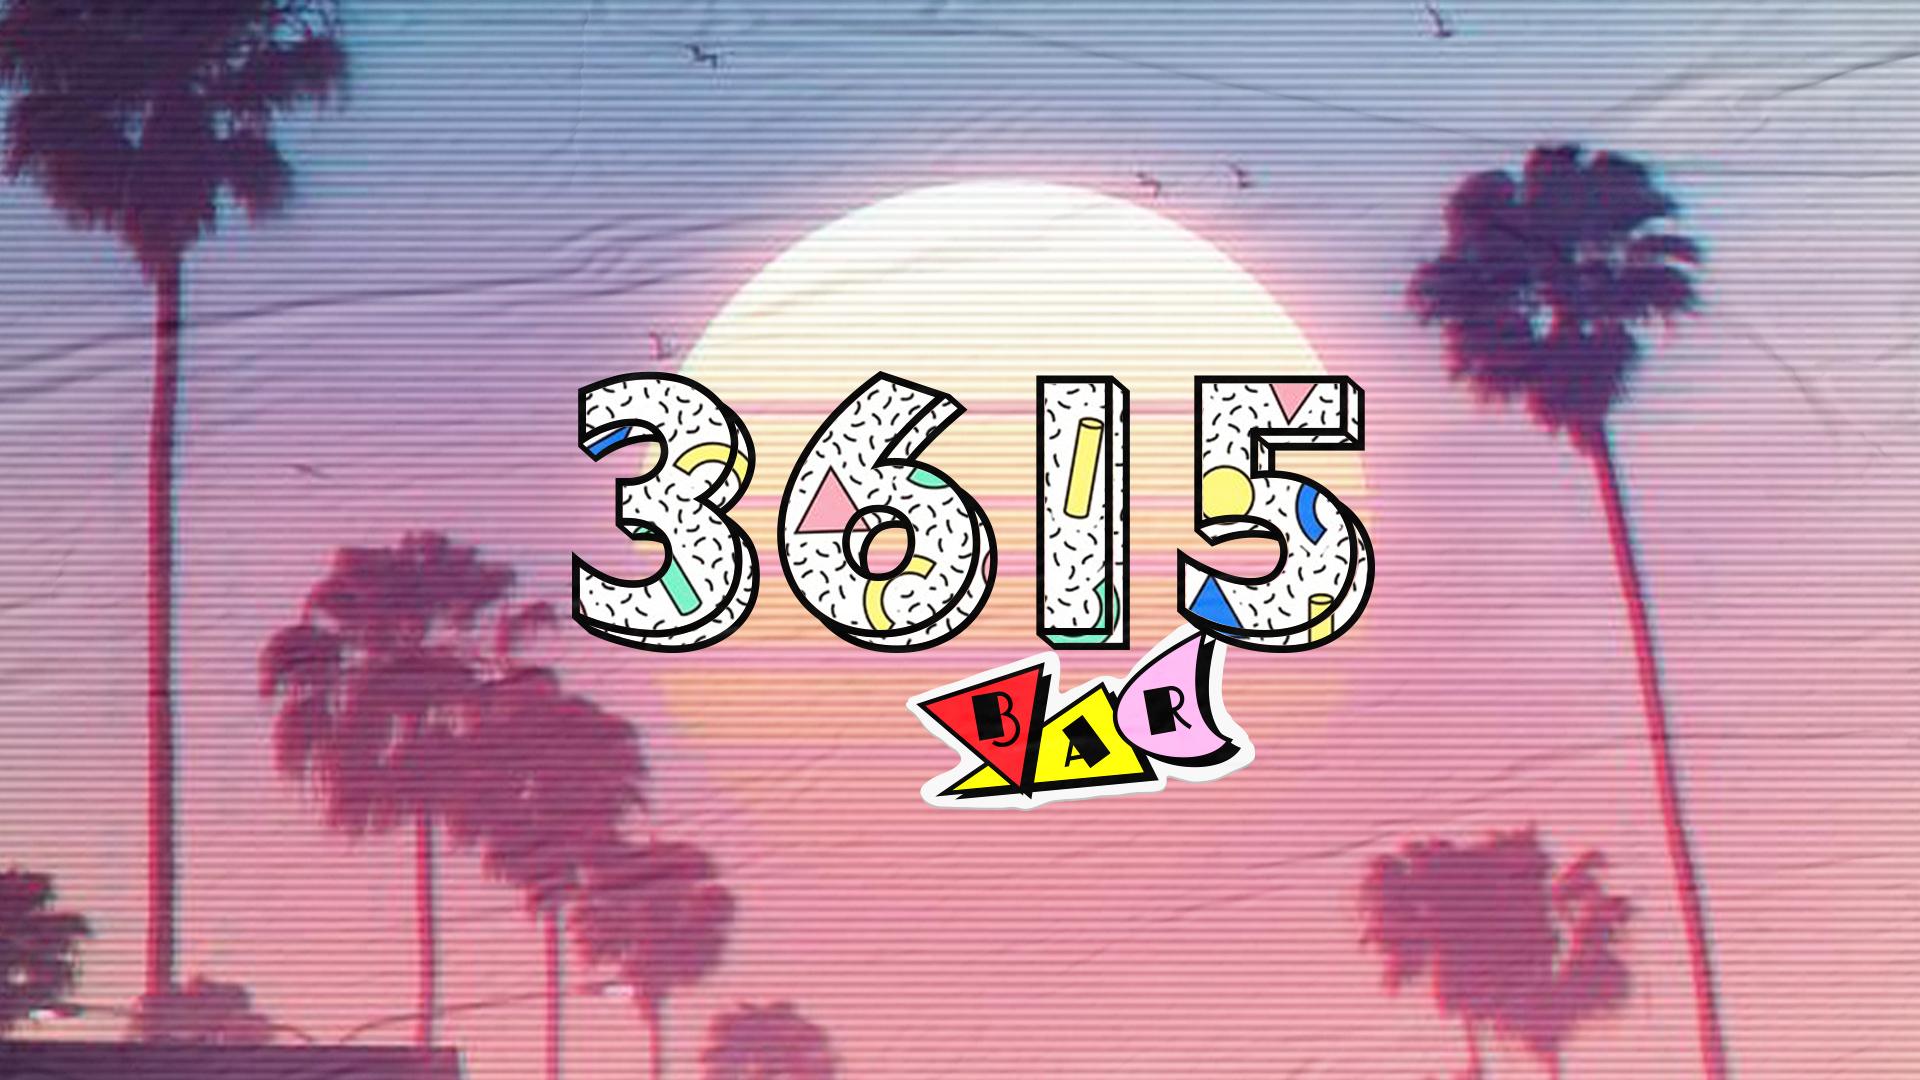 © 3615